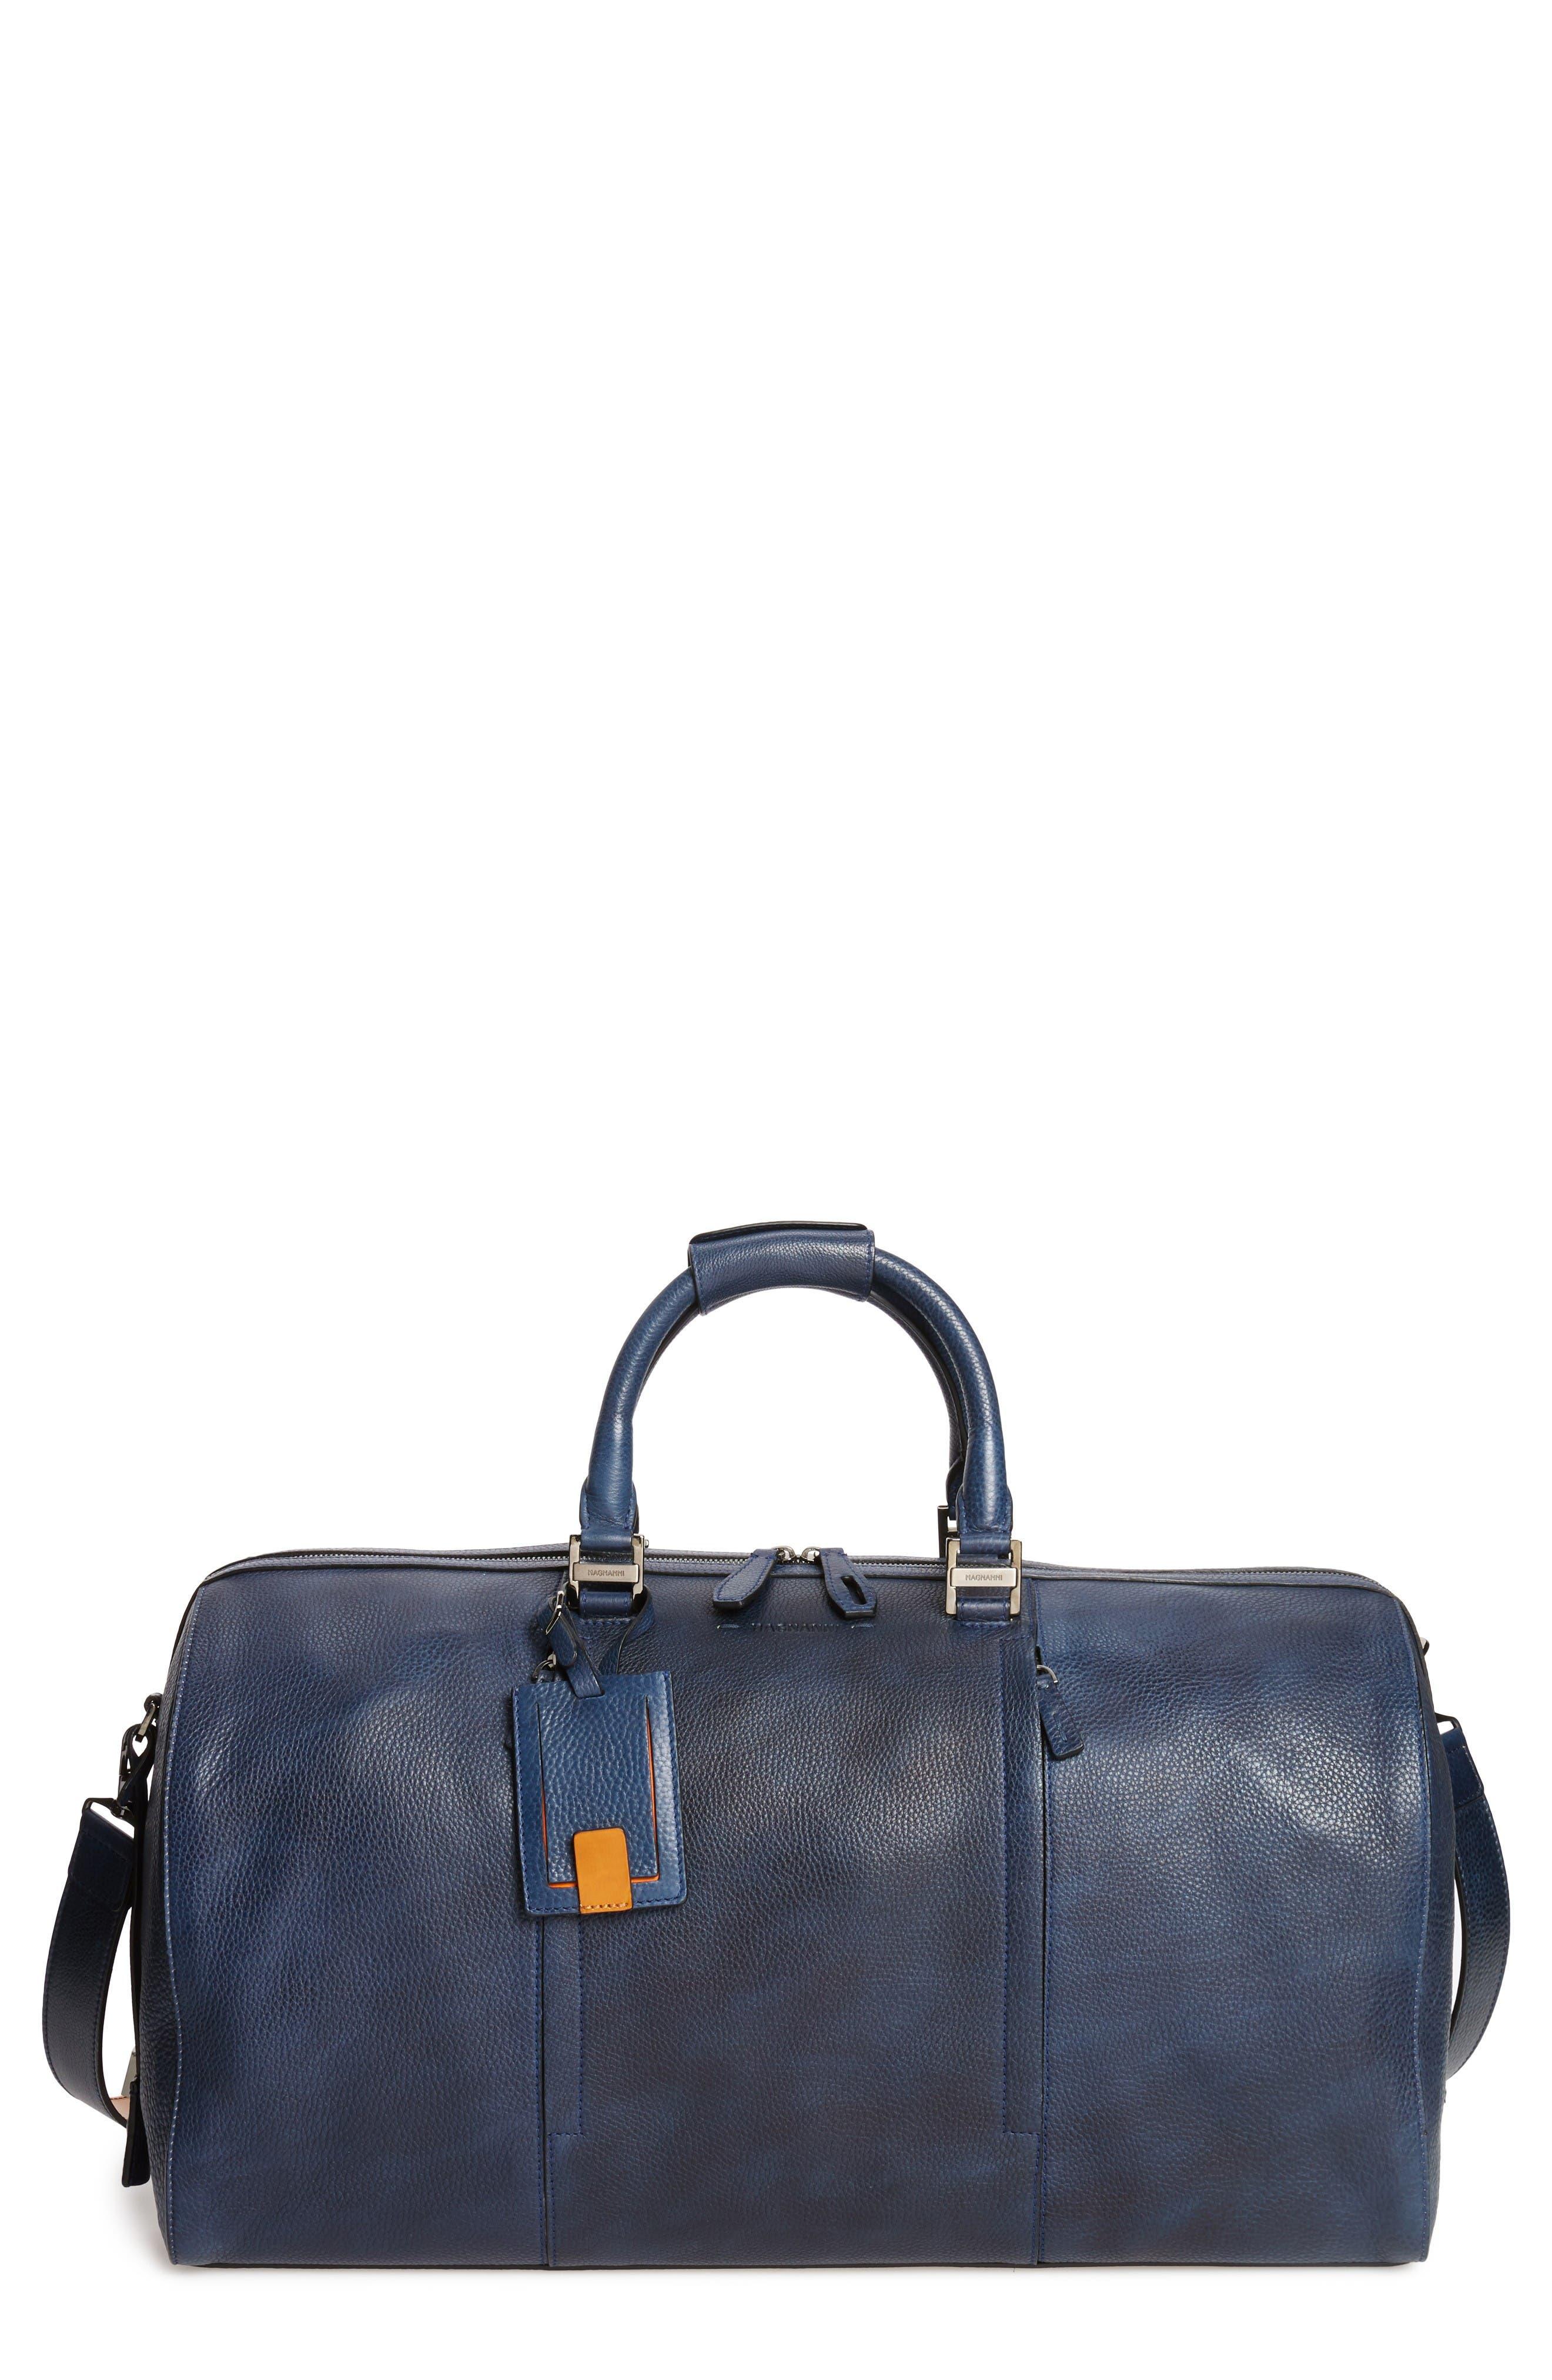 Main Image - Magnanni Traveler Leather Duffel Bag